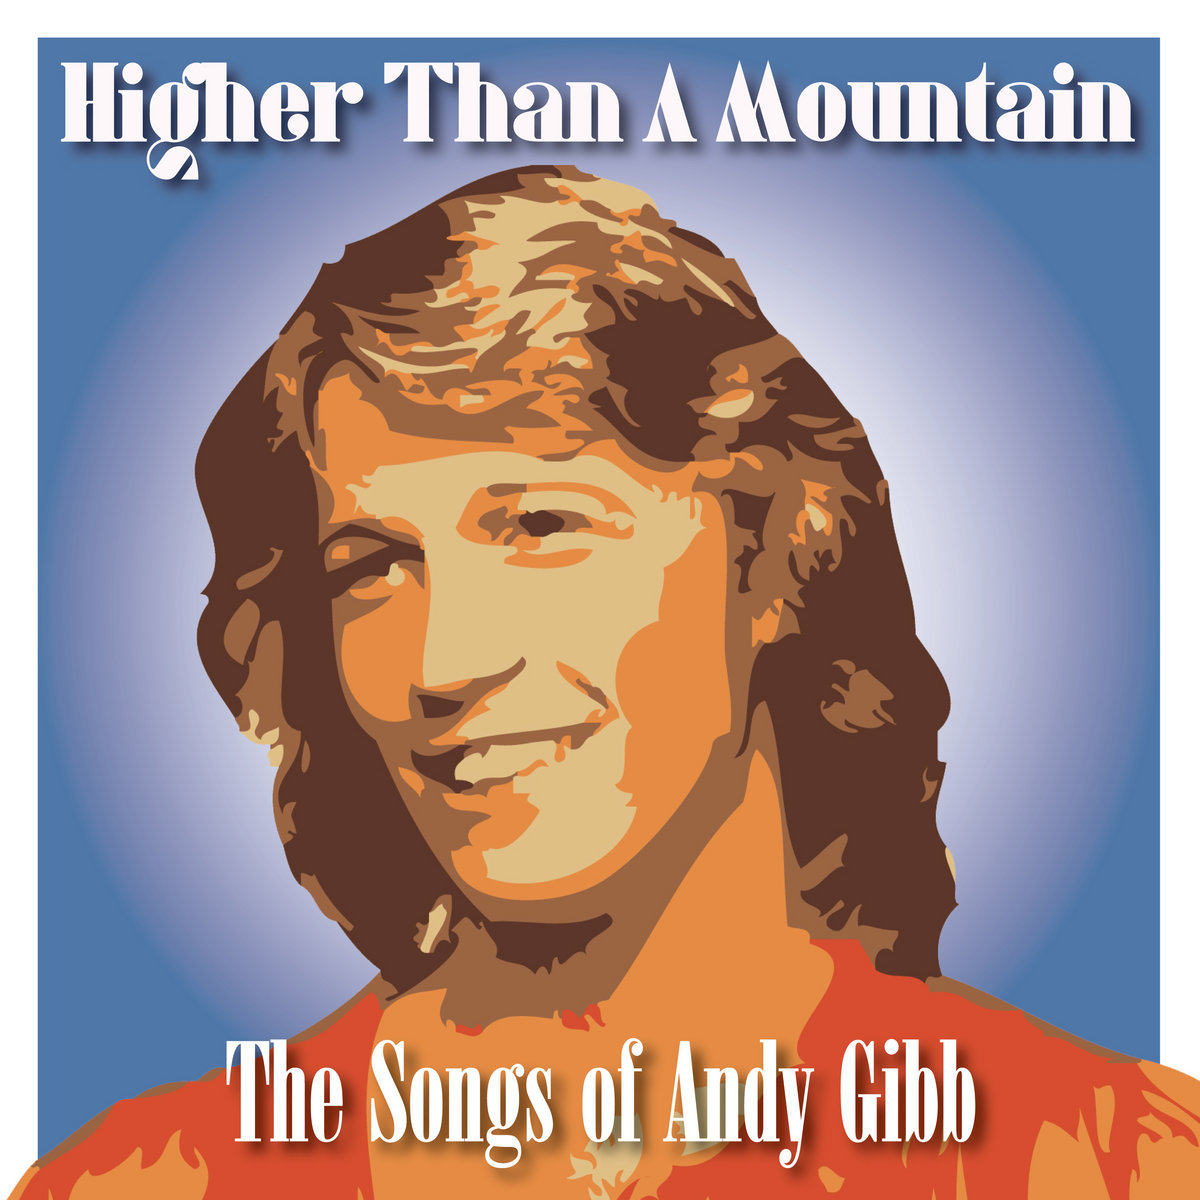 Higher Than a Mountain